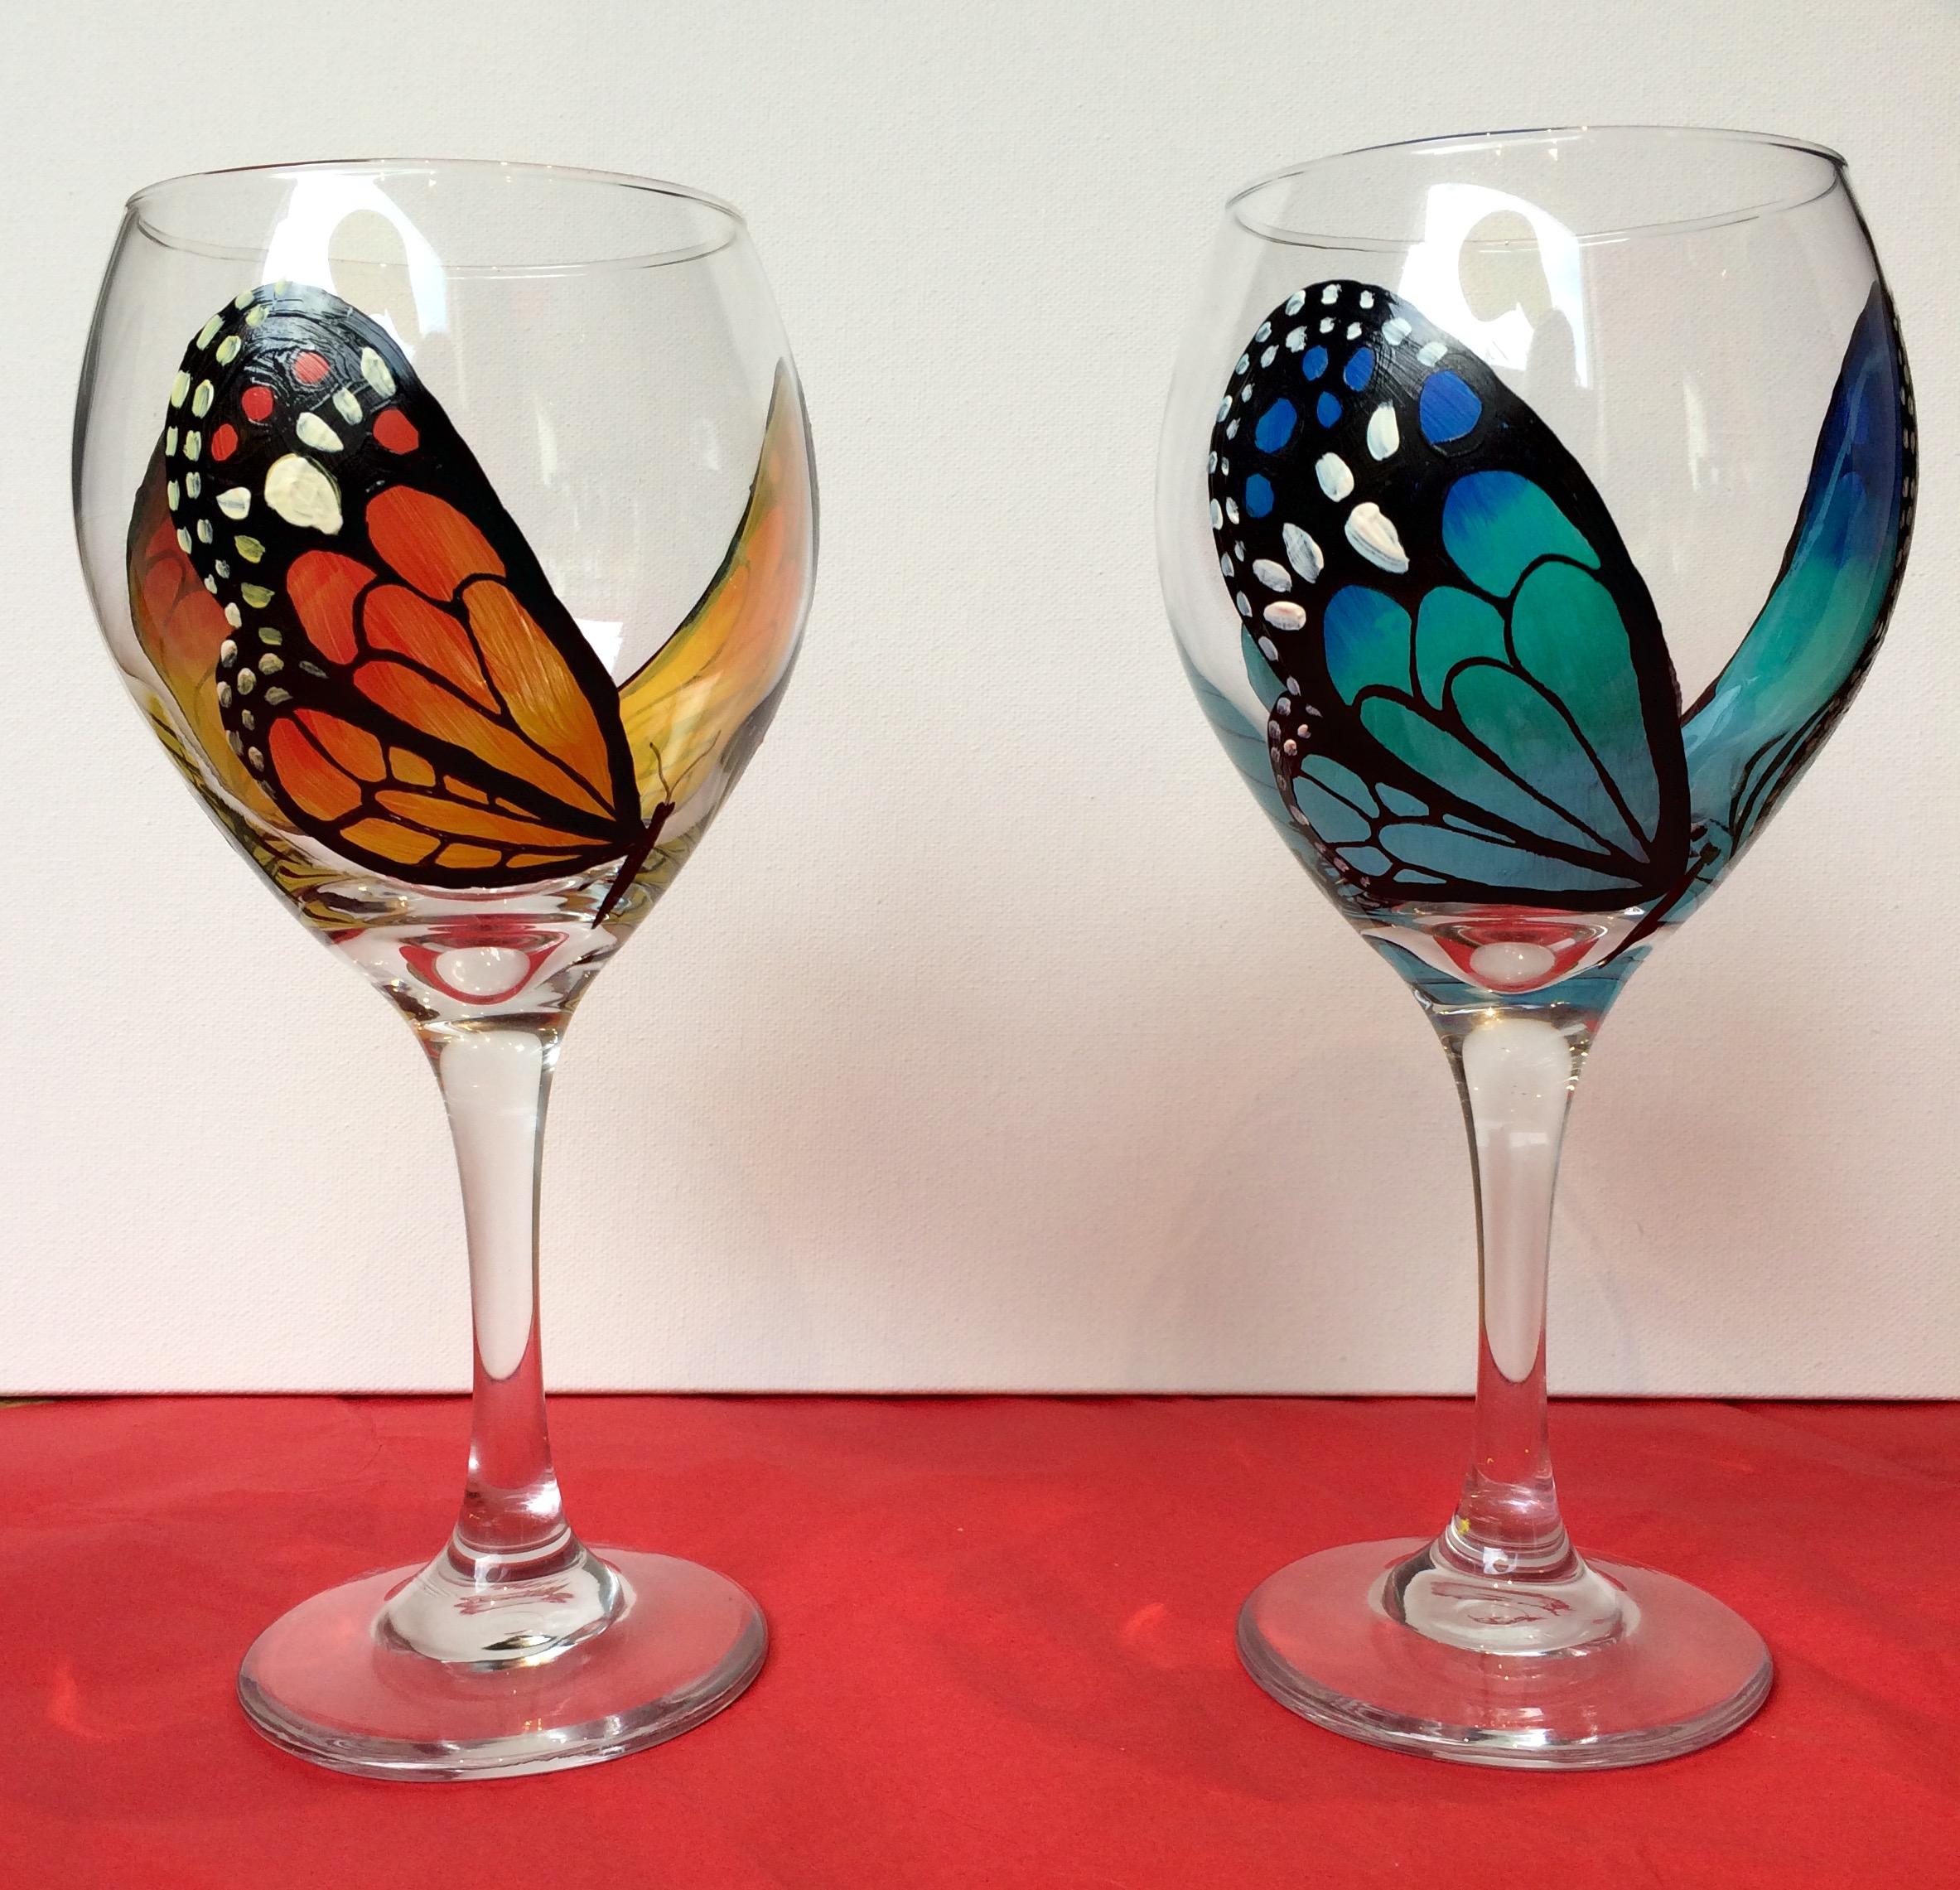 Wine glass coffee mug painting 2 00 4 00pm paint fun studio